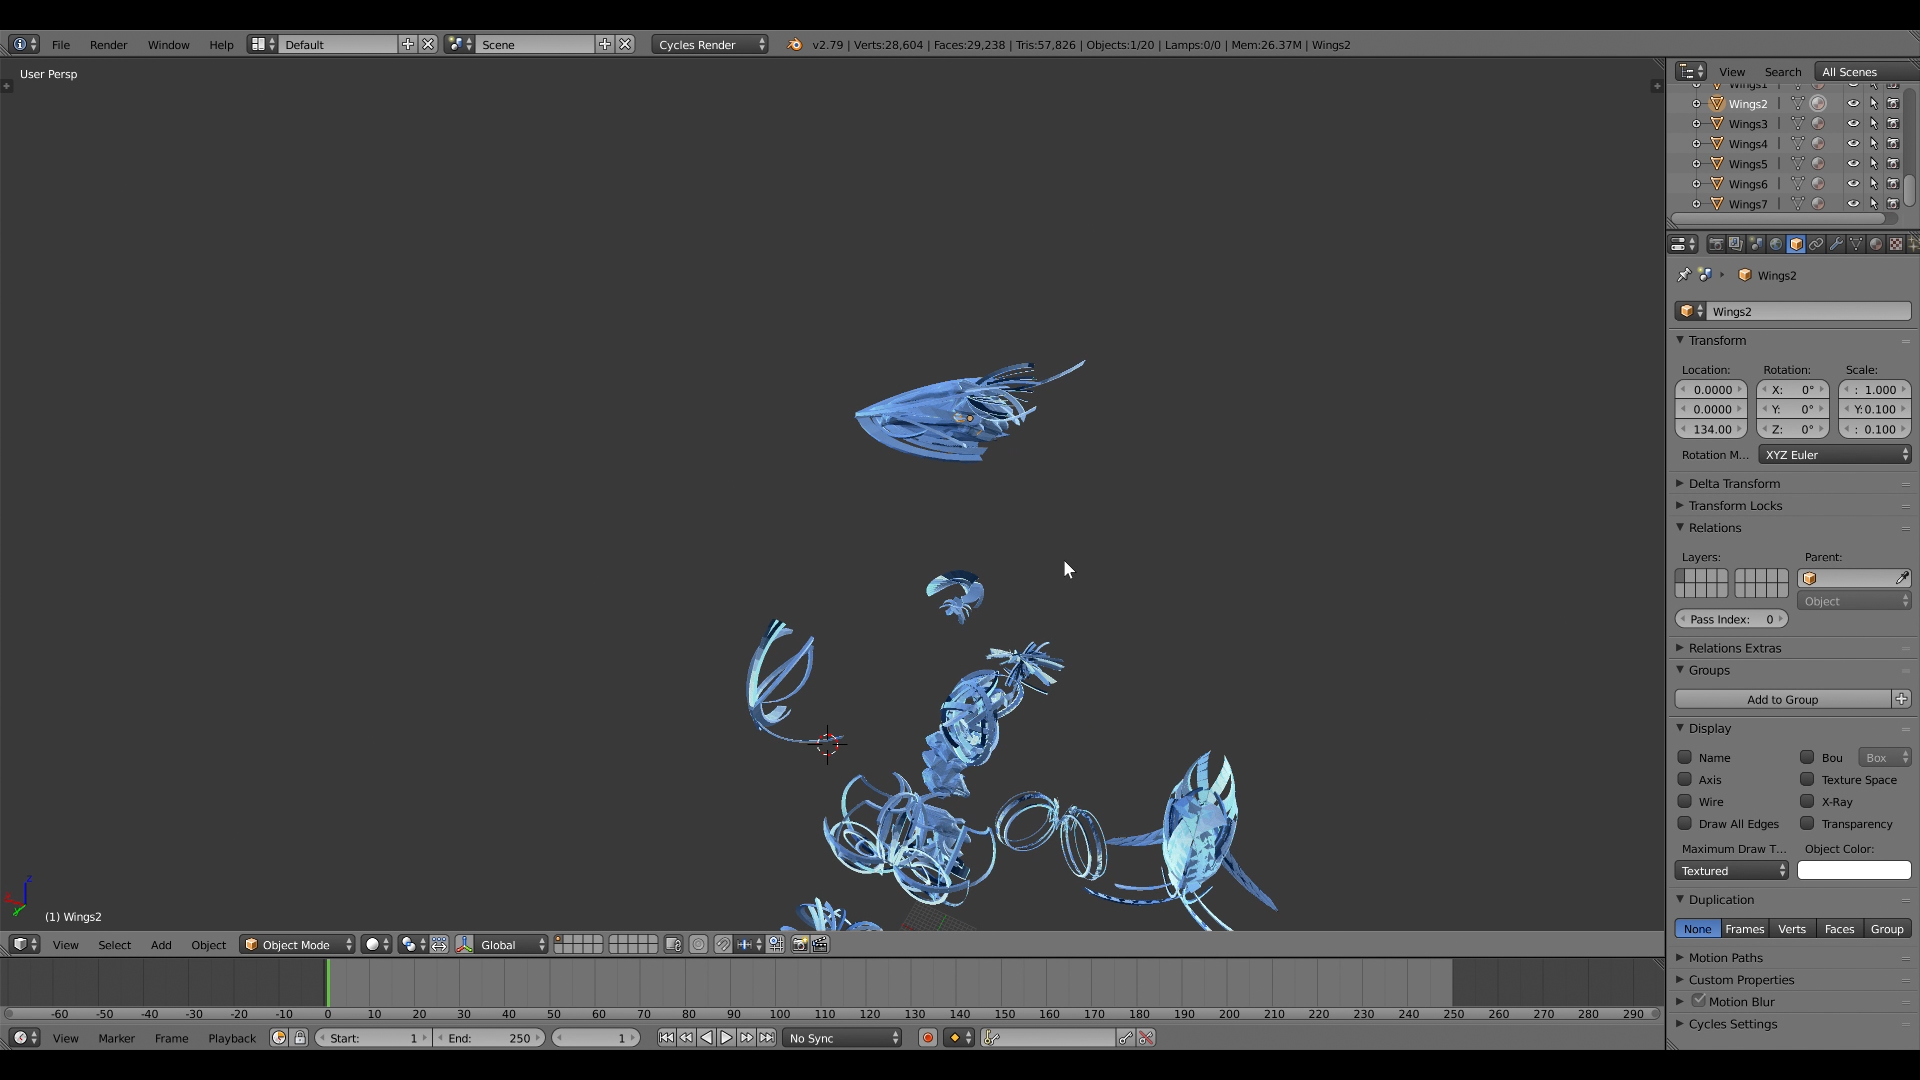 ScreenCaptureExporter1Image1.jpg